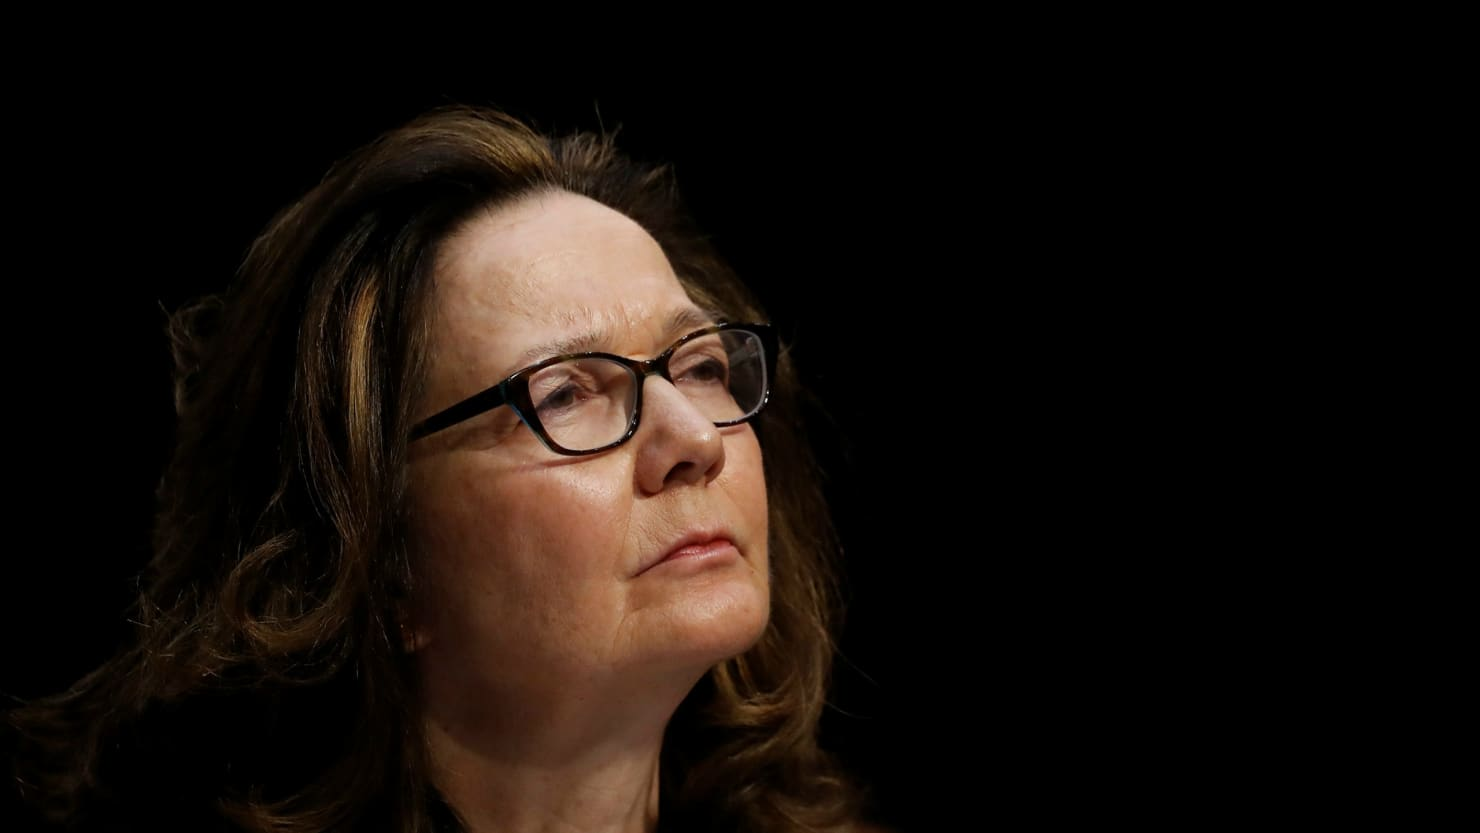 CIA Director Nominee Gina Haspel Clears Senate Intel Panel